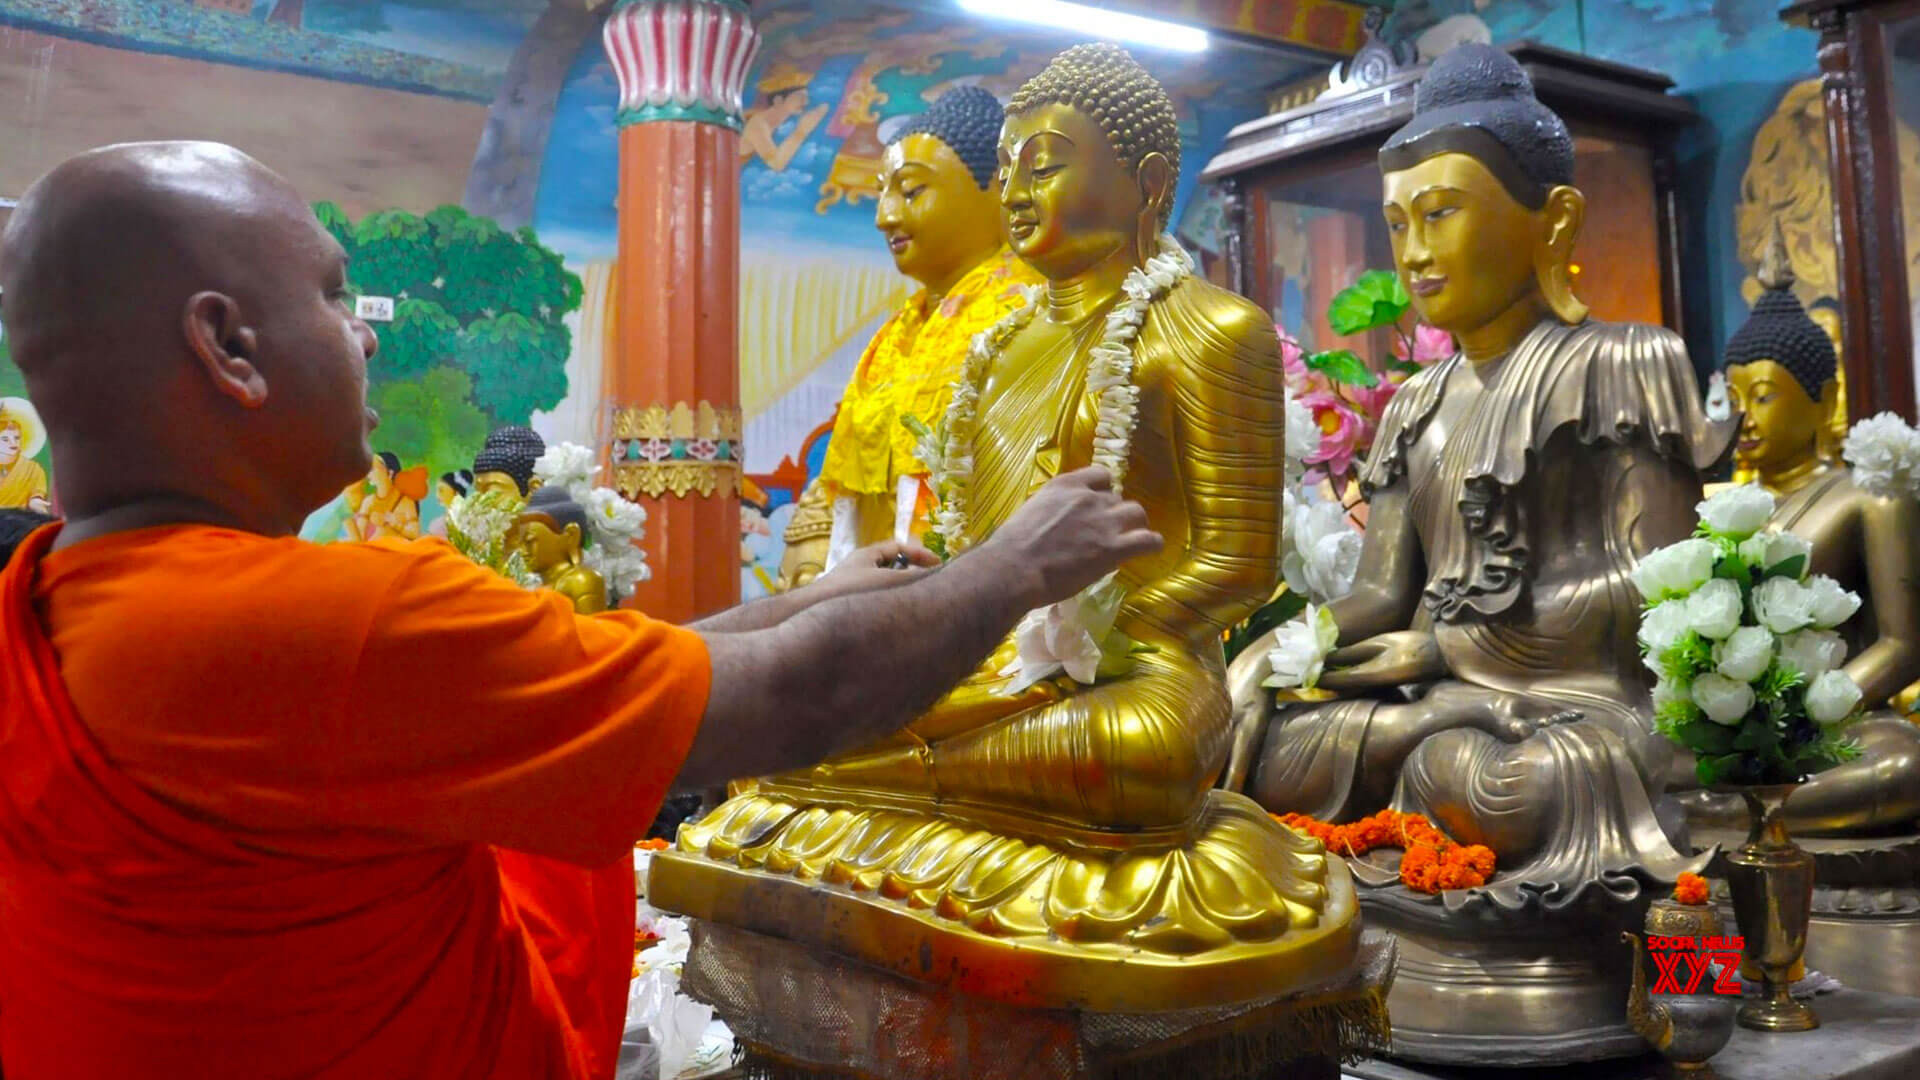 Popular Festival Celebrated In Uttar Pradesh-Buddha Purnima